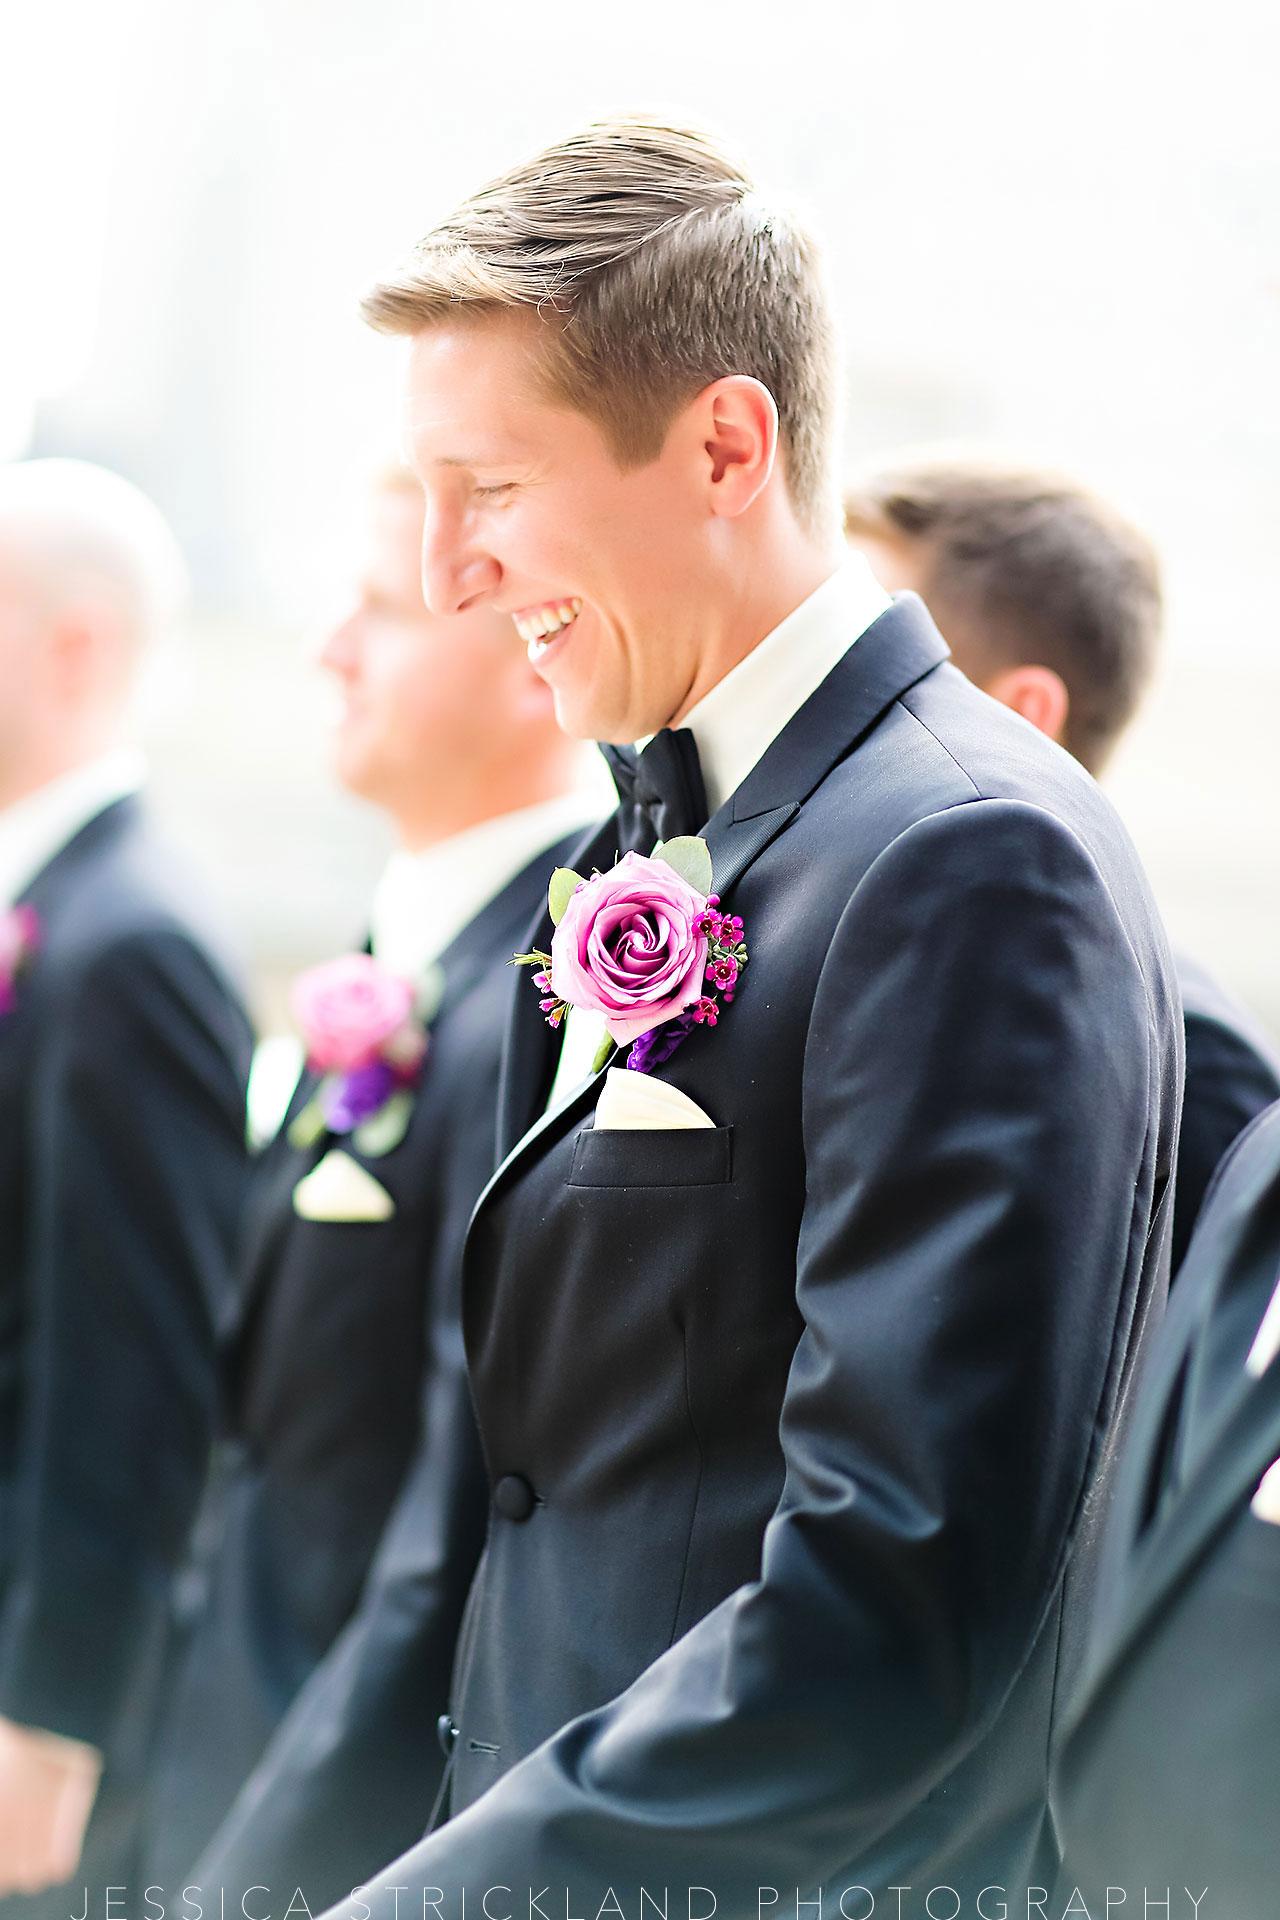 Serra Alex Regions Tower Indianapolis Wedding 247 watermarked